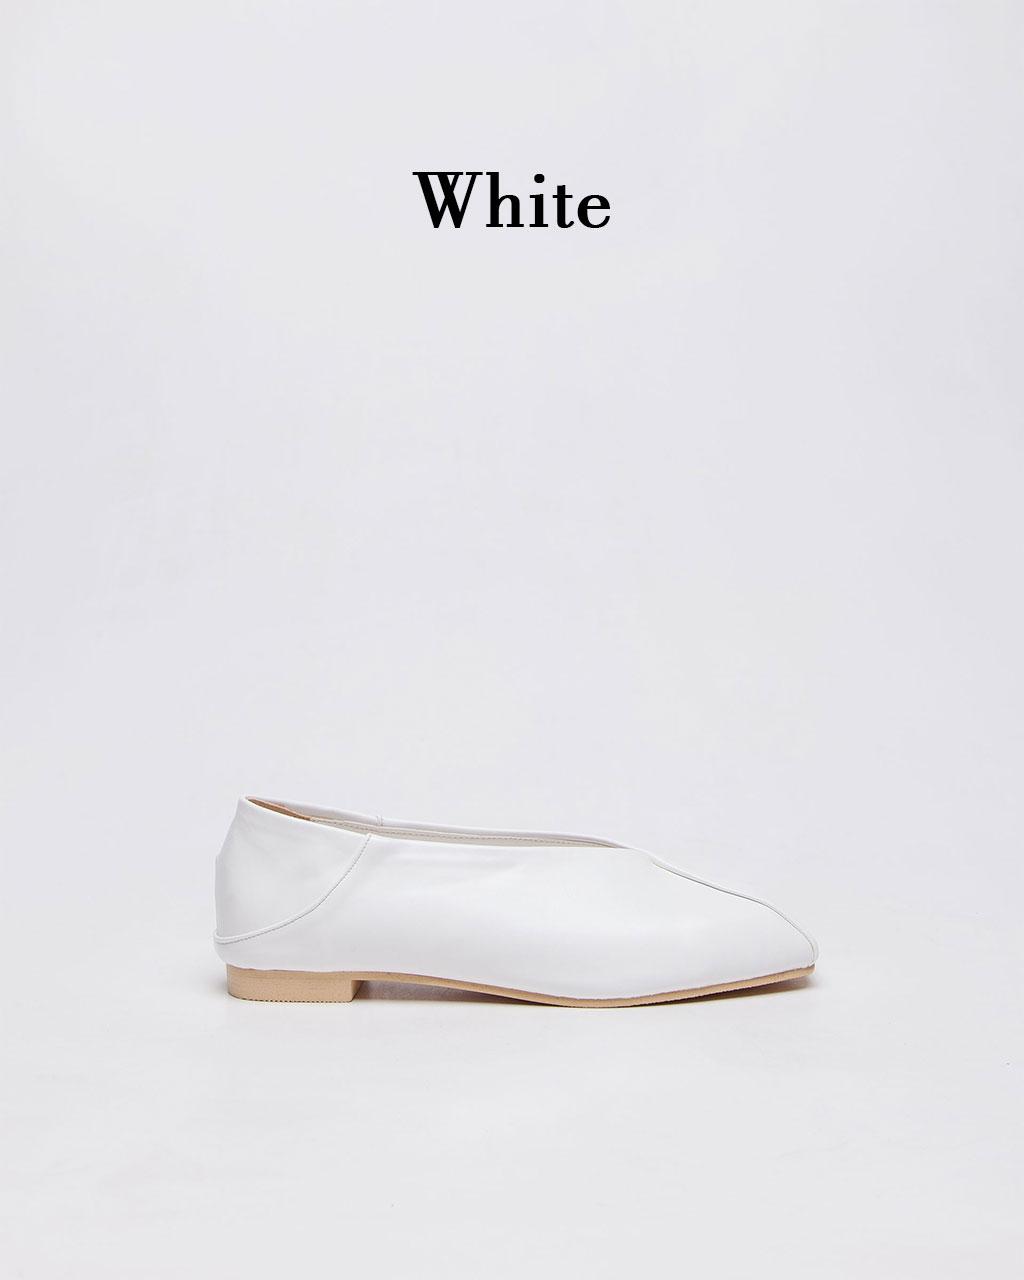 Tagtraume Leaf-04 - White(화이트)